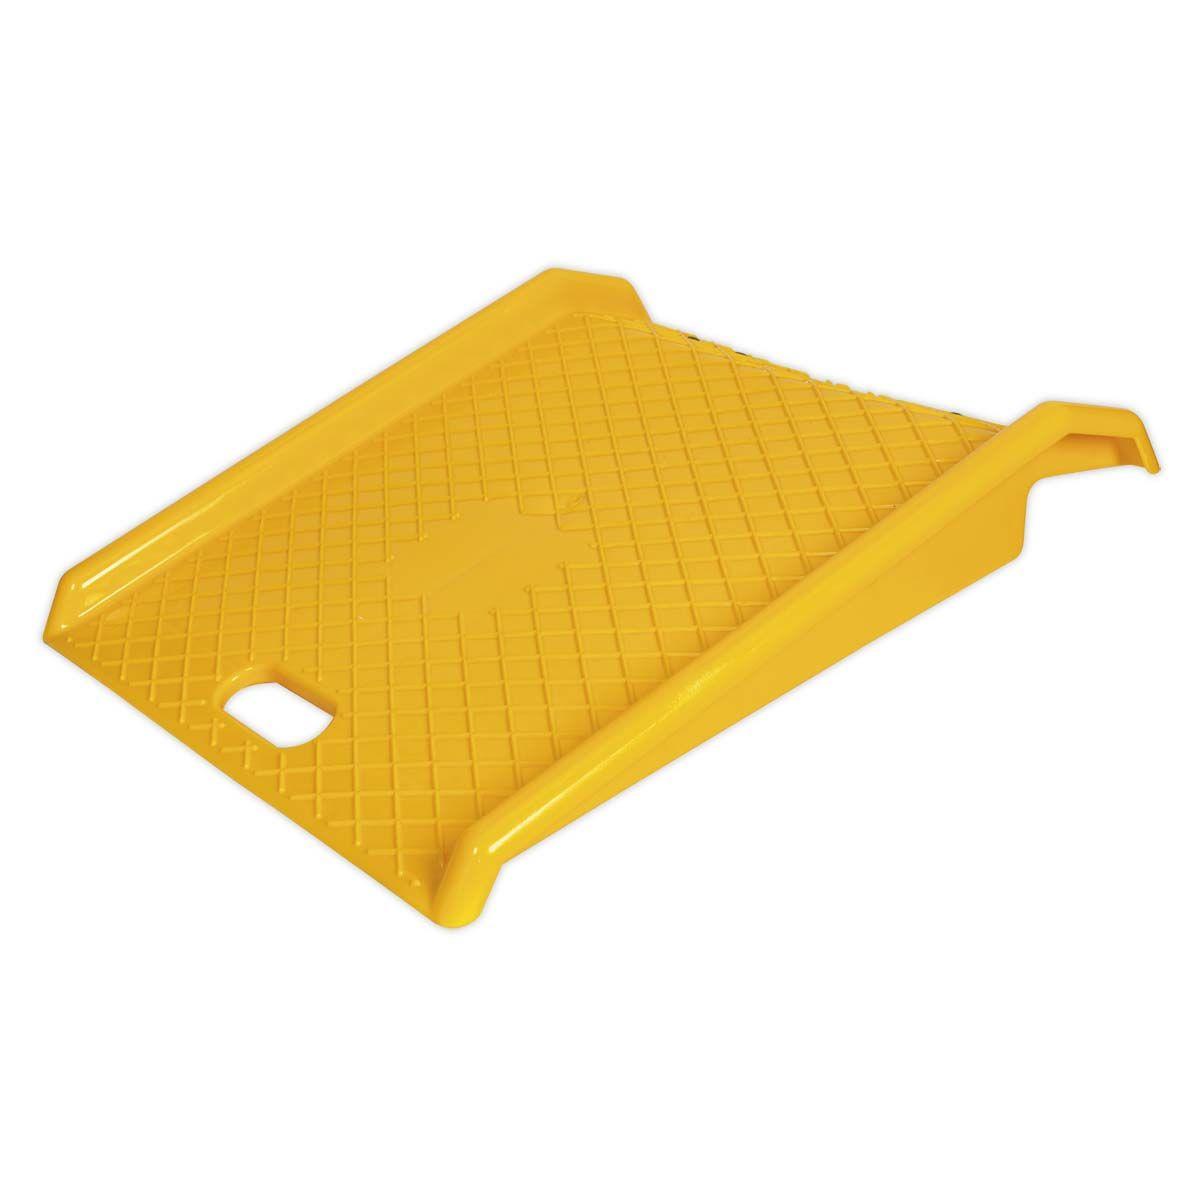 Sealey Portable Access Ramp 450kg Capacity